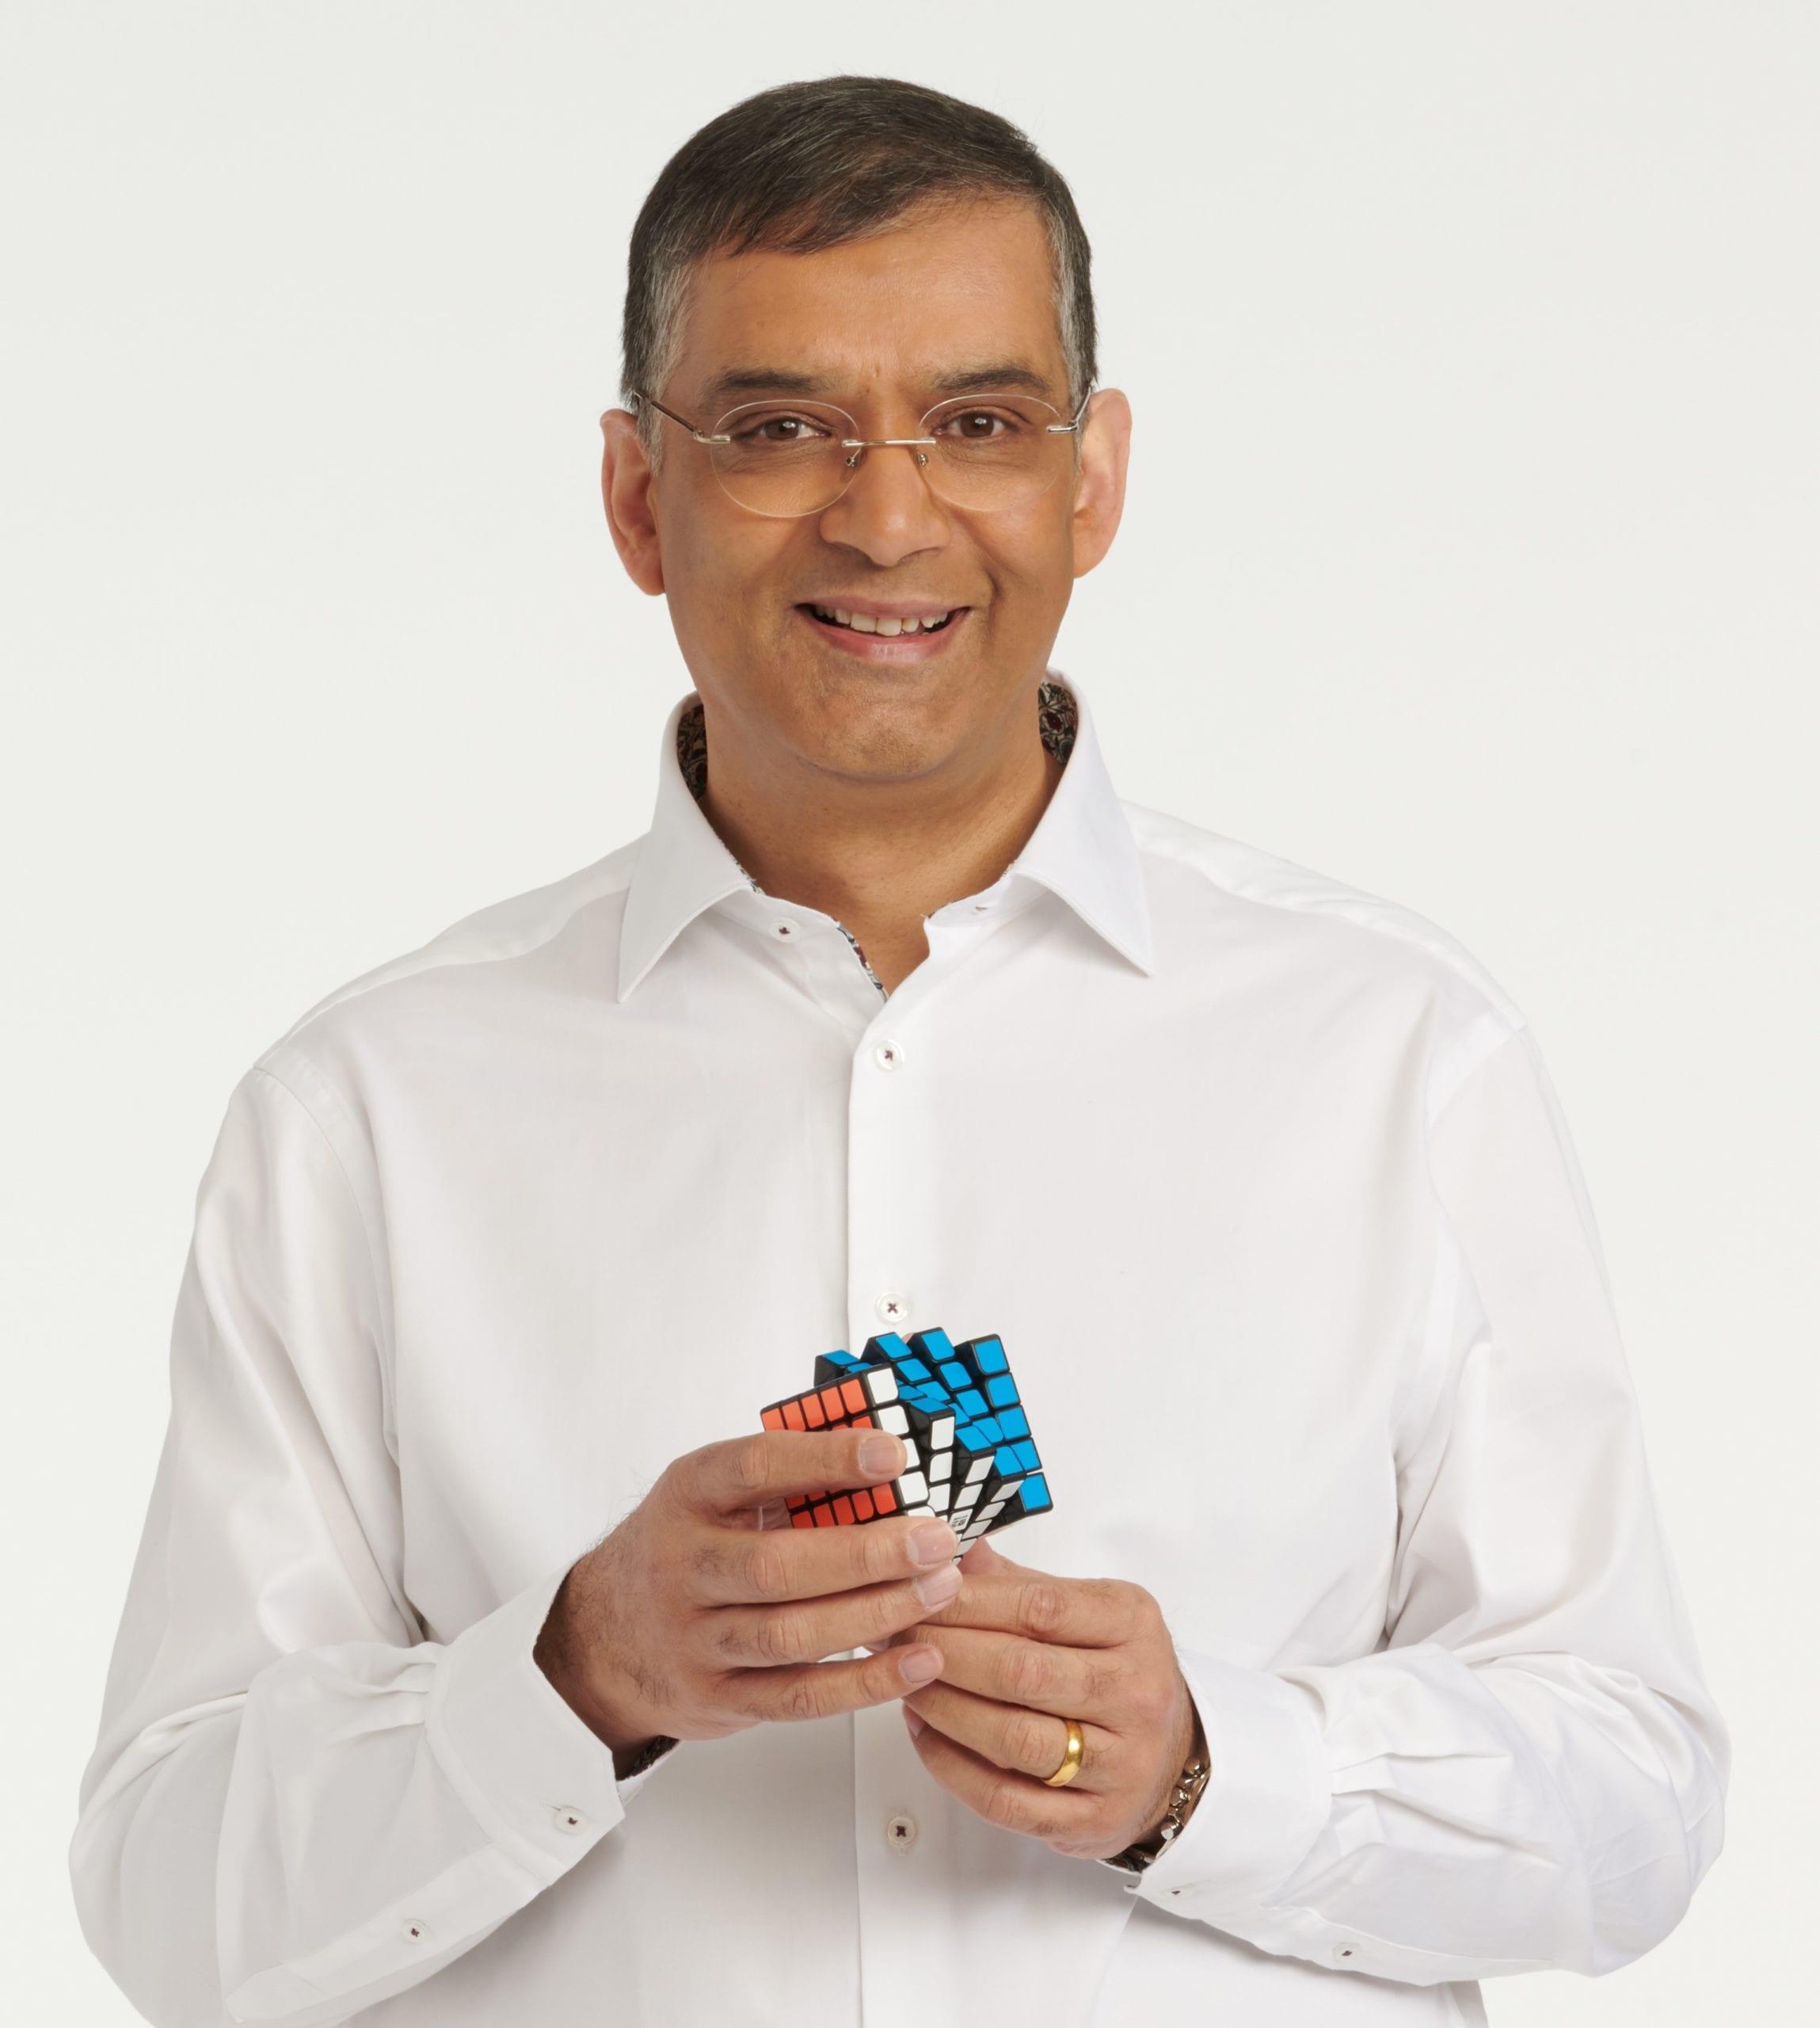 Rashik Parmar stands holding a Rubik's cube